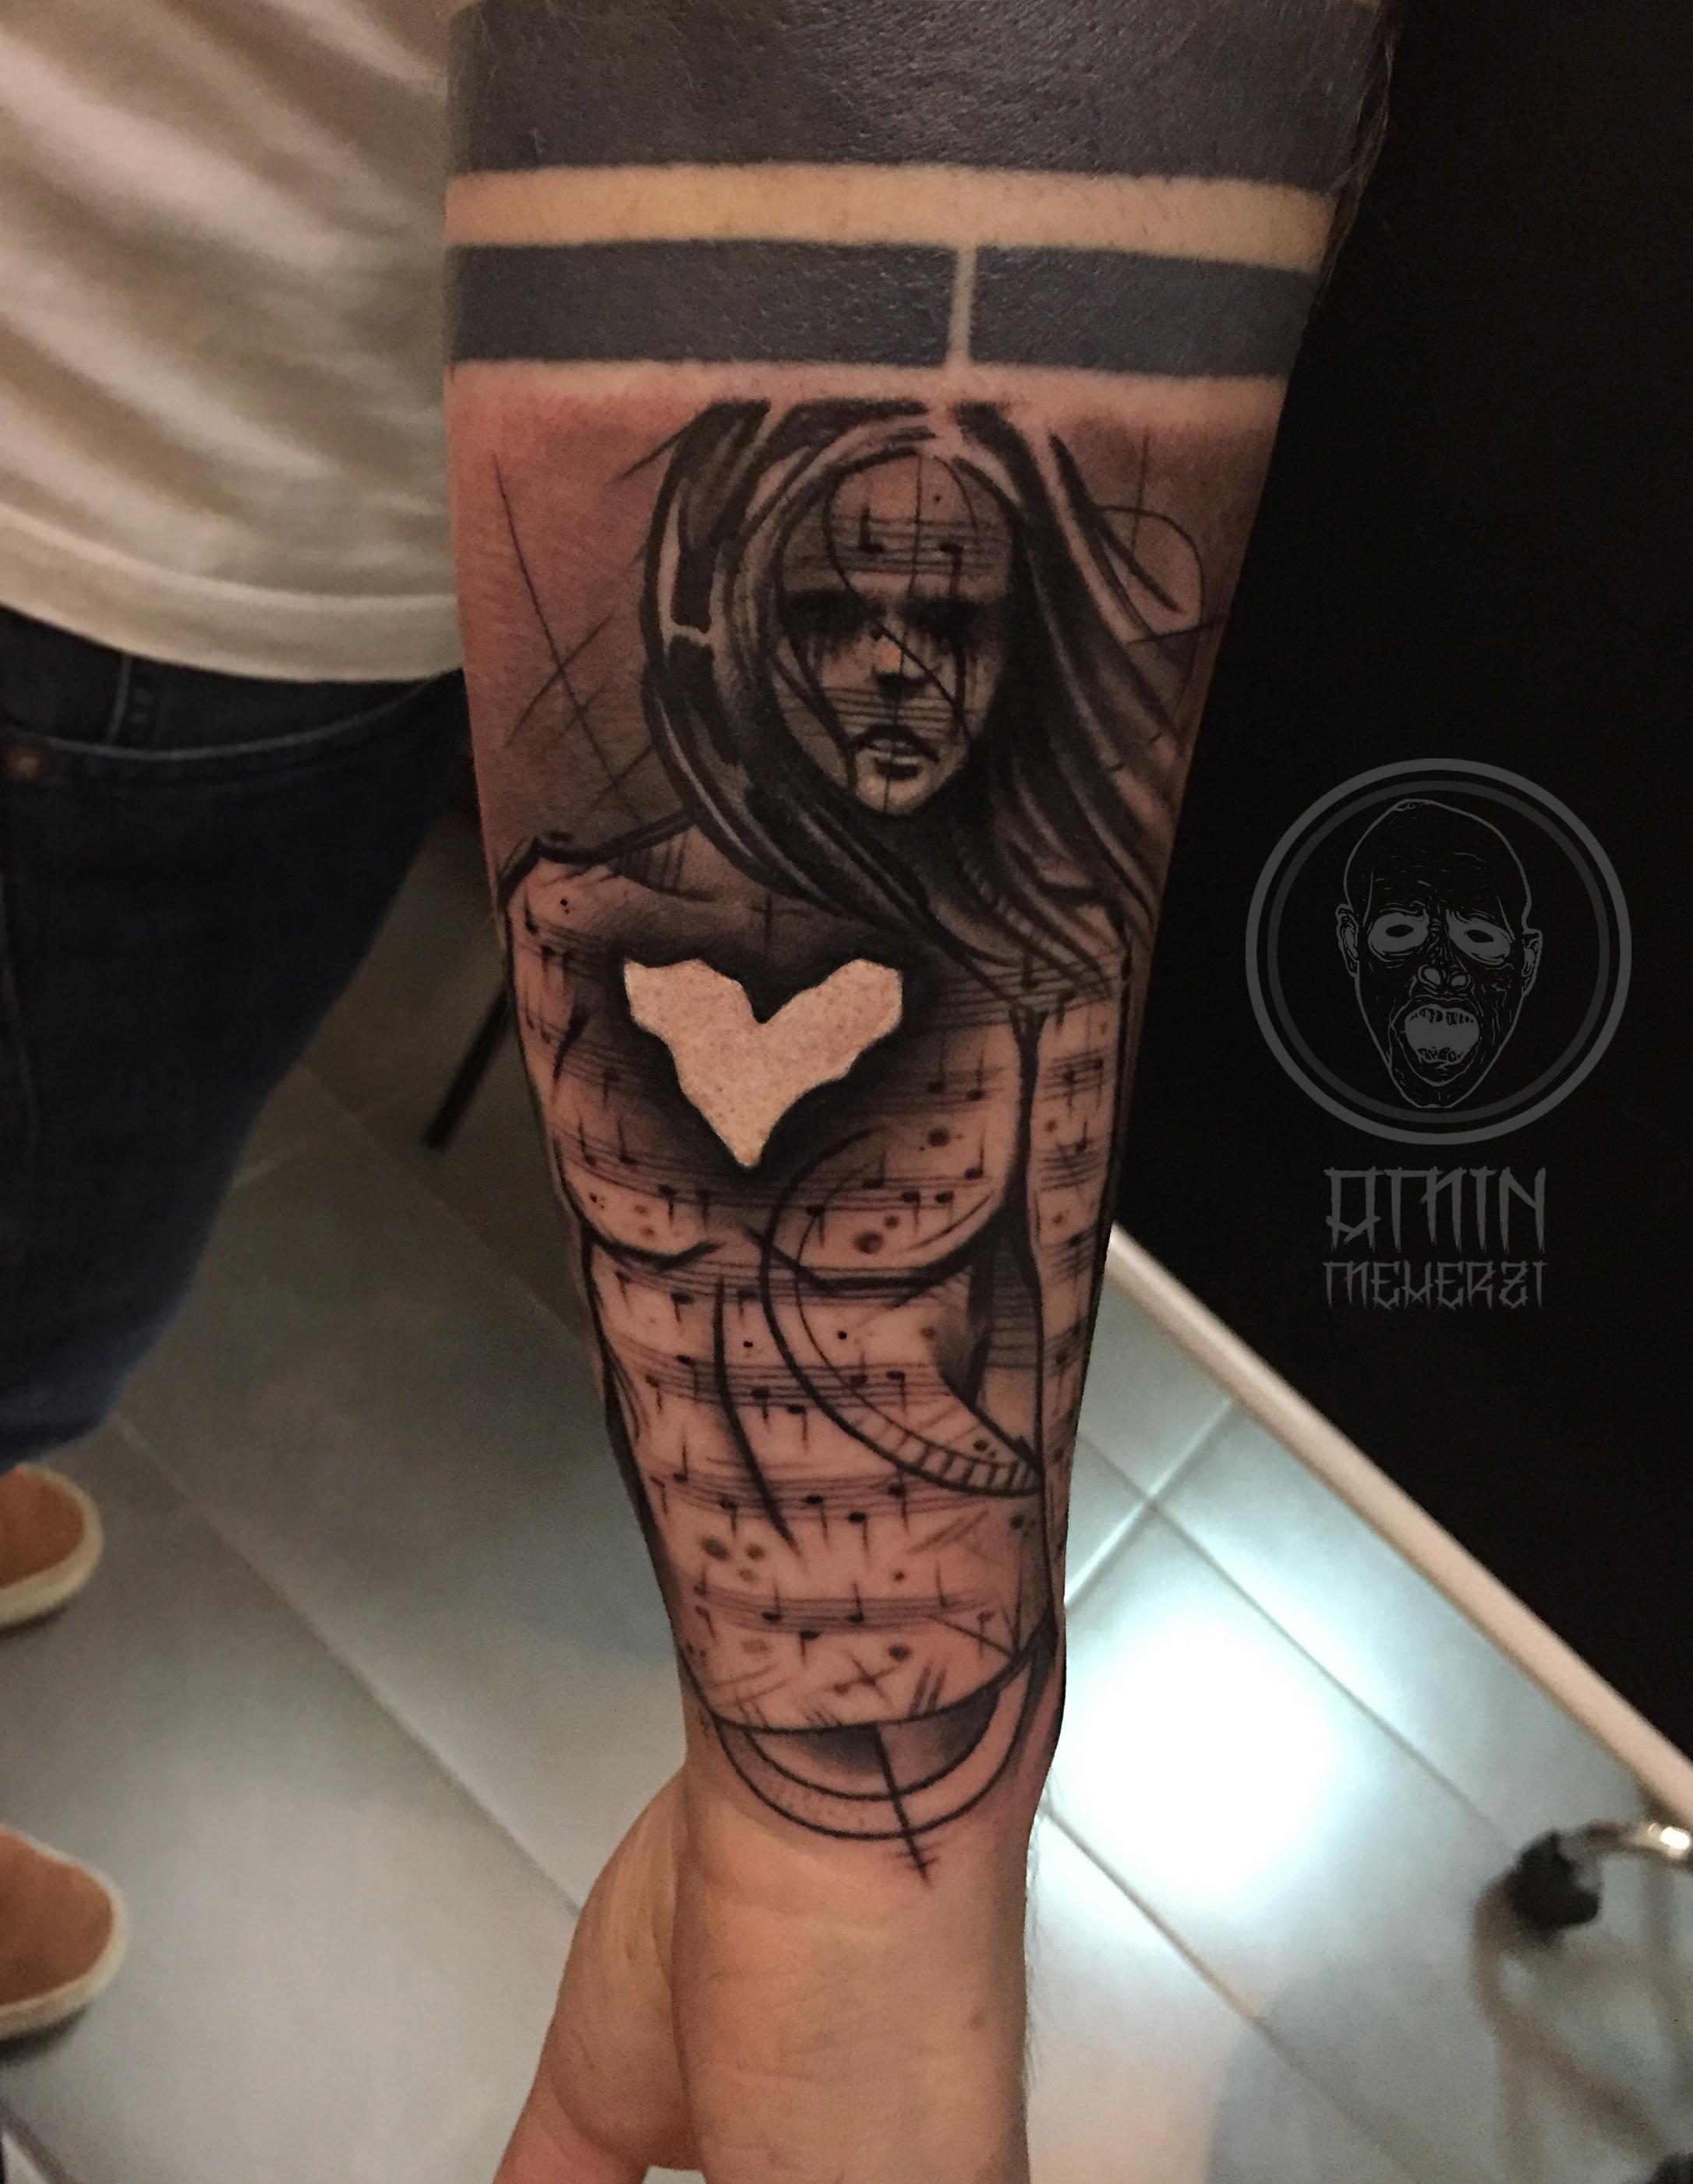 Opus Magnum Tattoo Wien Music Girl   Tattoolife Tattoowork Tattoo Ink Worldofink Inkmaster Tattoogirl Tattooidea Tattoos Tattooworks Viennatattoo Tattoomagazine Tattooconvention Inkwork Realisictattoo Realisticink Tattooshop Blackandgrey Blackandgraytattoo Skin Skinartmag tattoorevuemag supportgoodtattooing sharonalday tattoocommunity tattooedlife tattooed inkedup tattooculture artwork tattooscout tattoodo tattoodobabes myworldofink  tattu tatu opusmagnumtattoo killerink besttattoo besttattooing bestoftattooink tattooing mastertattoo mastertattooing mastertatu mastertattooer tattooer besttattooever bestinktattoo besttattooartist  tattooartist reasliticartist realistictattooartist tattooingartist  inkartist awsometattoo awsomtattooartist awsomtattooartists awsomtattooing awsomink awsomtattoorealistic awsomtattoohyperrealistic nicetattoo nicetattooart nicetattoowork nicetattooink nicetattooart famoustattoo famoustattooart famousartwork famostattooartist goodtattooing goodtattoos goodtattoorealistic tattooconvention inportainttattoo importainttattooart importainttattoowork importaintartist importantrealistictattoo importainttattooing tattoogun amintattoo aminart aminmeherzitattoo amintattooartist amin aminartist meherzitattoo aminmeherzi 1150wien schweglerstaße skintattoo tattoooftheday tattoooftheweek tattooofthejear tattooprice tattooinfinity tattoos tattooblack tattooapointment tattooaustria usatattoo lining liningtattoo insta instagram facebook fb projecttattoo project love fun progressing progress artofopusmagnum artofopus artofmagnum sullen sullentattoo sullenart sullenink worldfamousink killerinktattoo killerink killerinkamin shading shadingtattoo  sullen sullenfamily girlswithtattoo boyswithtattoo inkedman inkedboy inkedgirl design style tattoostyle lovemyjob lovetattoos wowtattoo realism realismtattoo realismtattooart silverbackink silverbacktattoo silverback tattooartgallarie gallerie galleri pritty prittytattoo prittytattooidea prittytattooing freshlyink fre